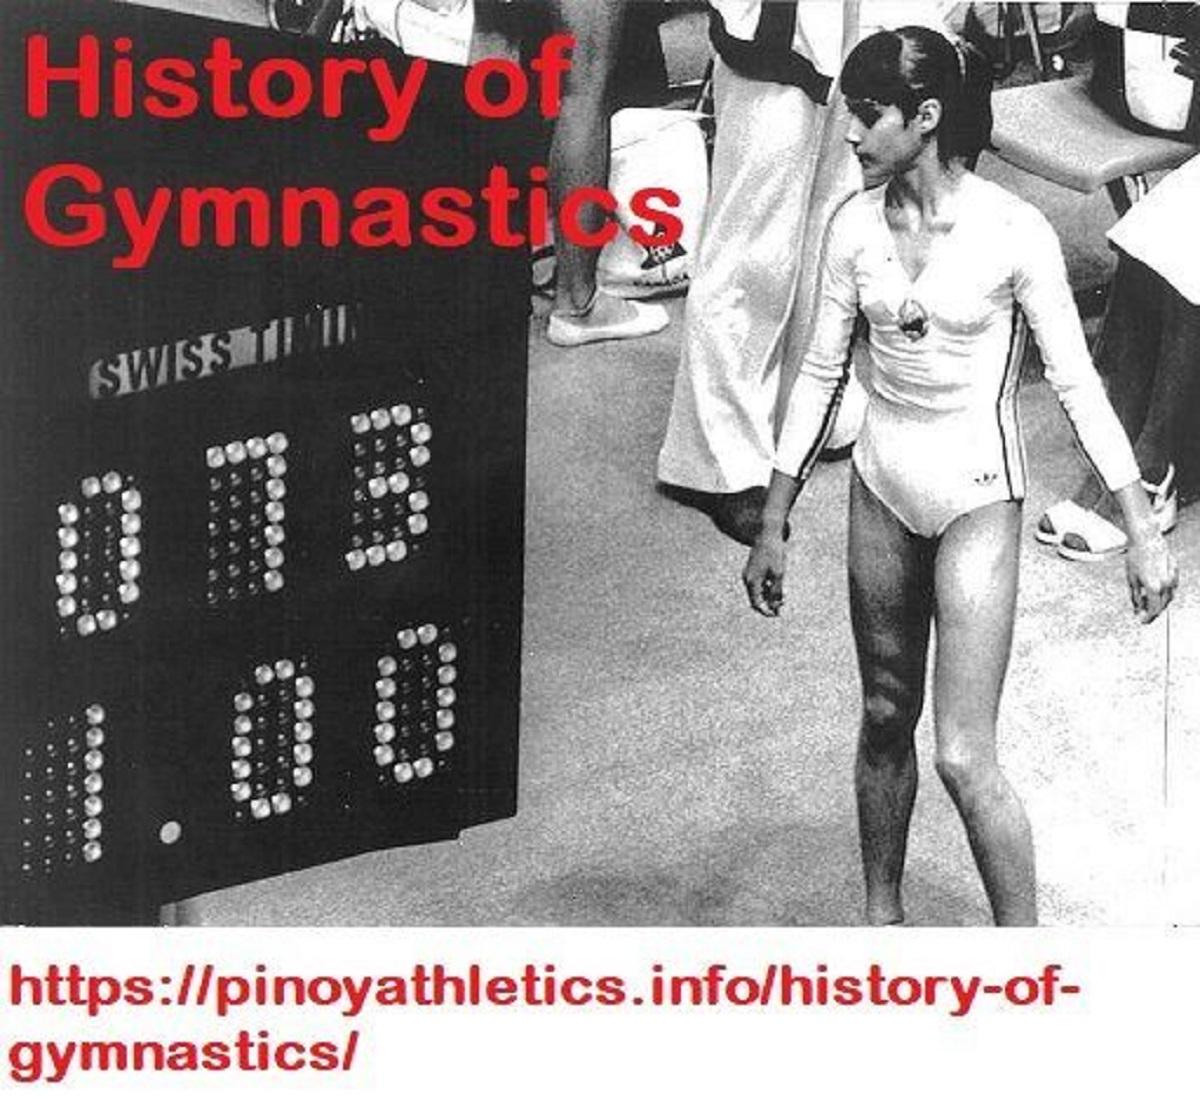 History for Gymnastics